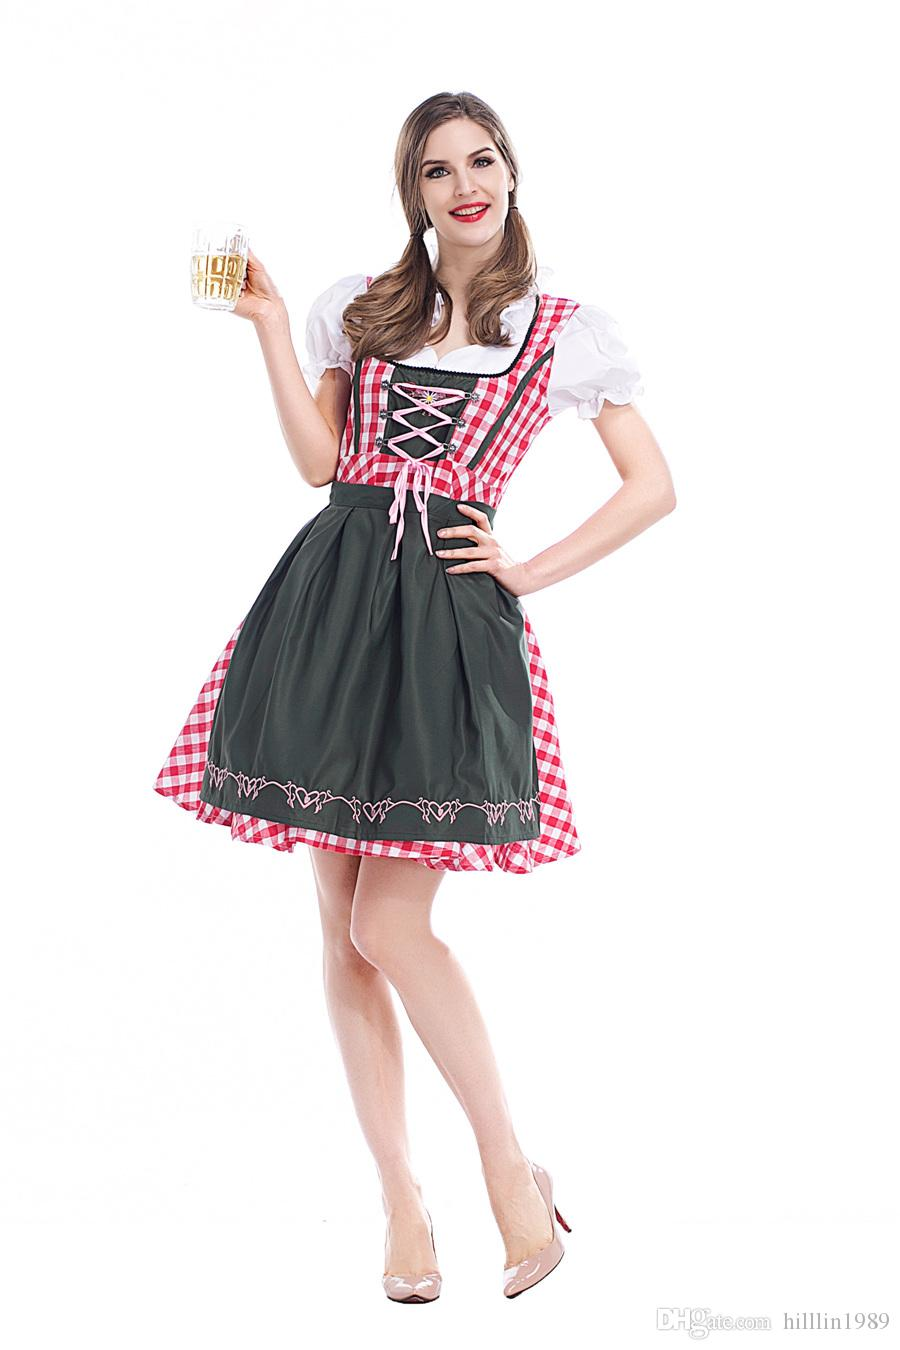 Grade Imprimir Bavarian Maid Cosplay alemão Oktoberfest Beergirl Fancy Dress cerveja Menina Outfits Carnaval Mardi Gras Waitress Uniforme